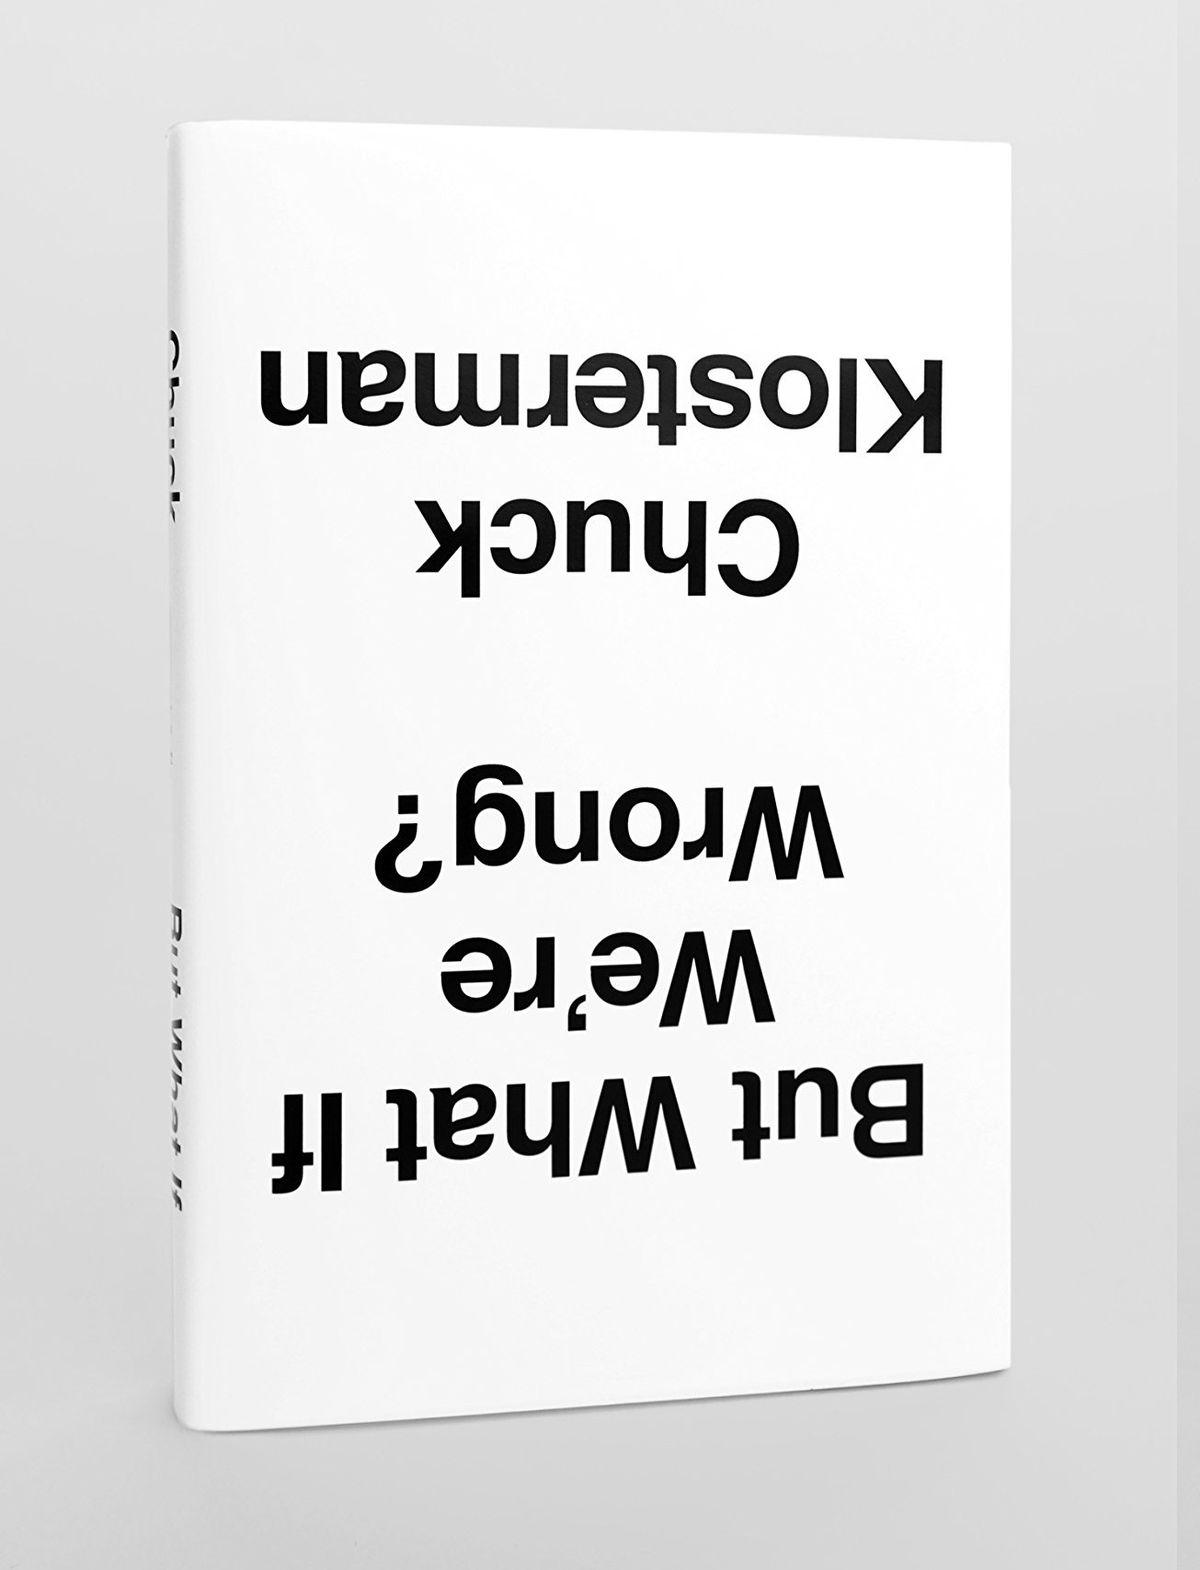 (Penguin RandomHouse)